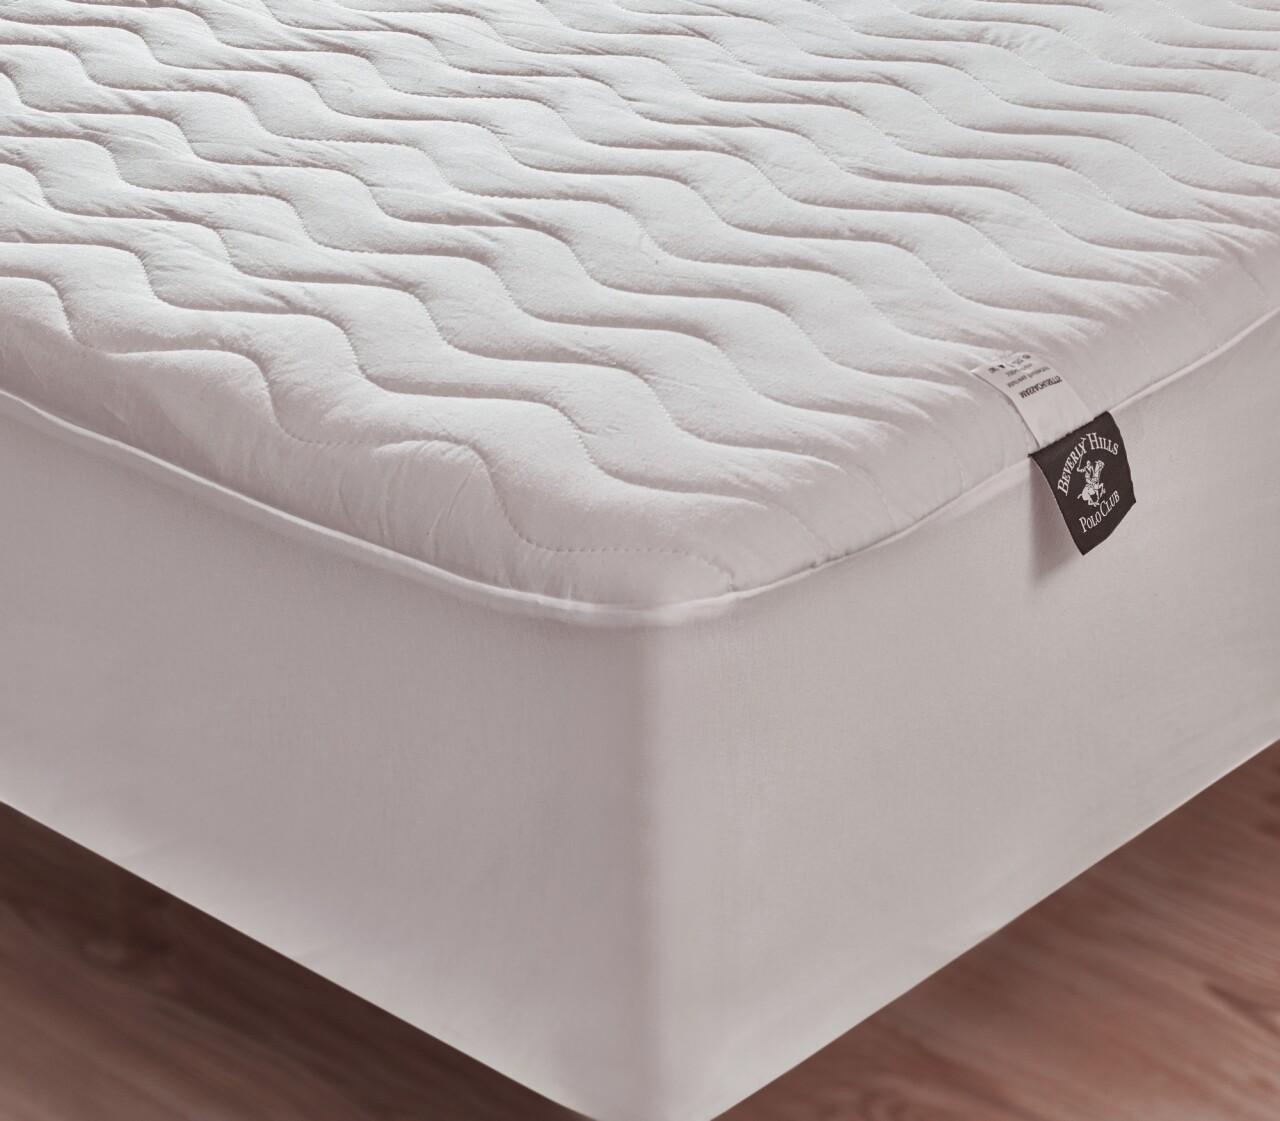 Husa protectie de pat dublu, 160x200 cm, 100% bumbac, Beverly Hills Polo Club, White